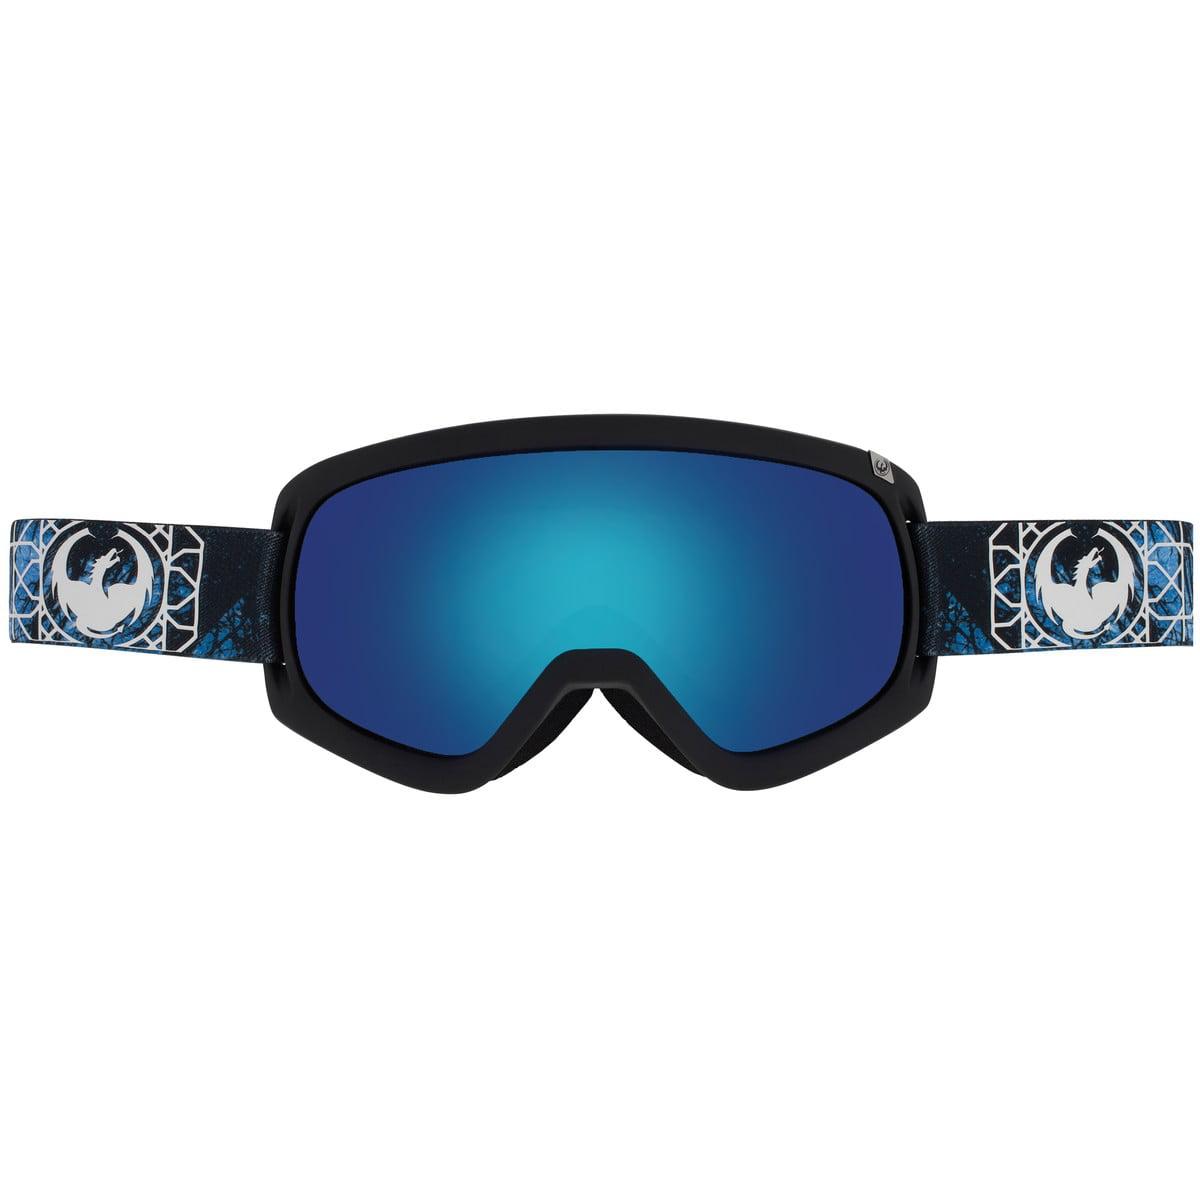 Dragon Alliance D3 Snow Goggle by Dragon Alliance